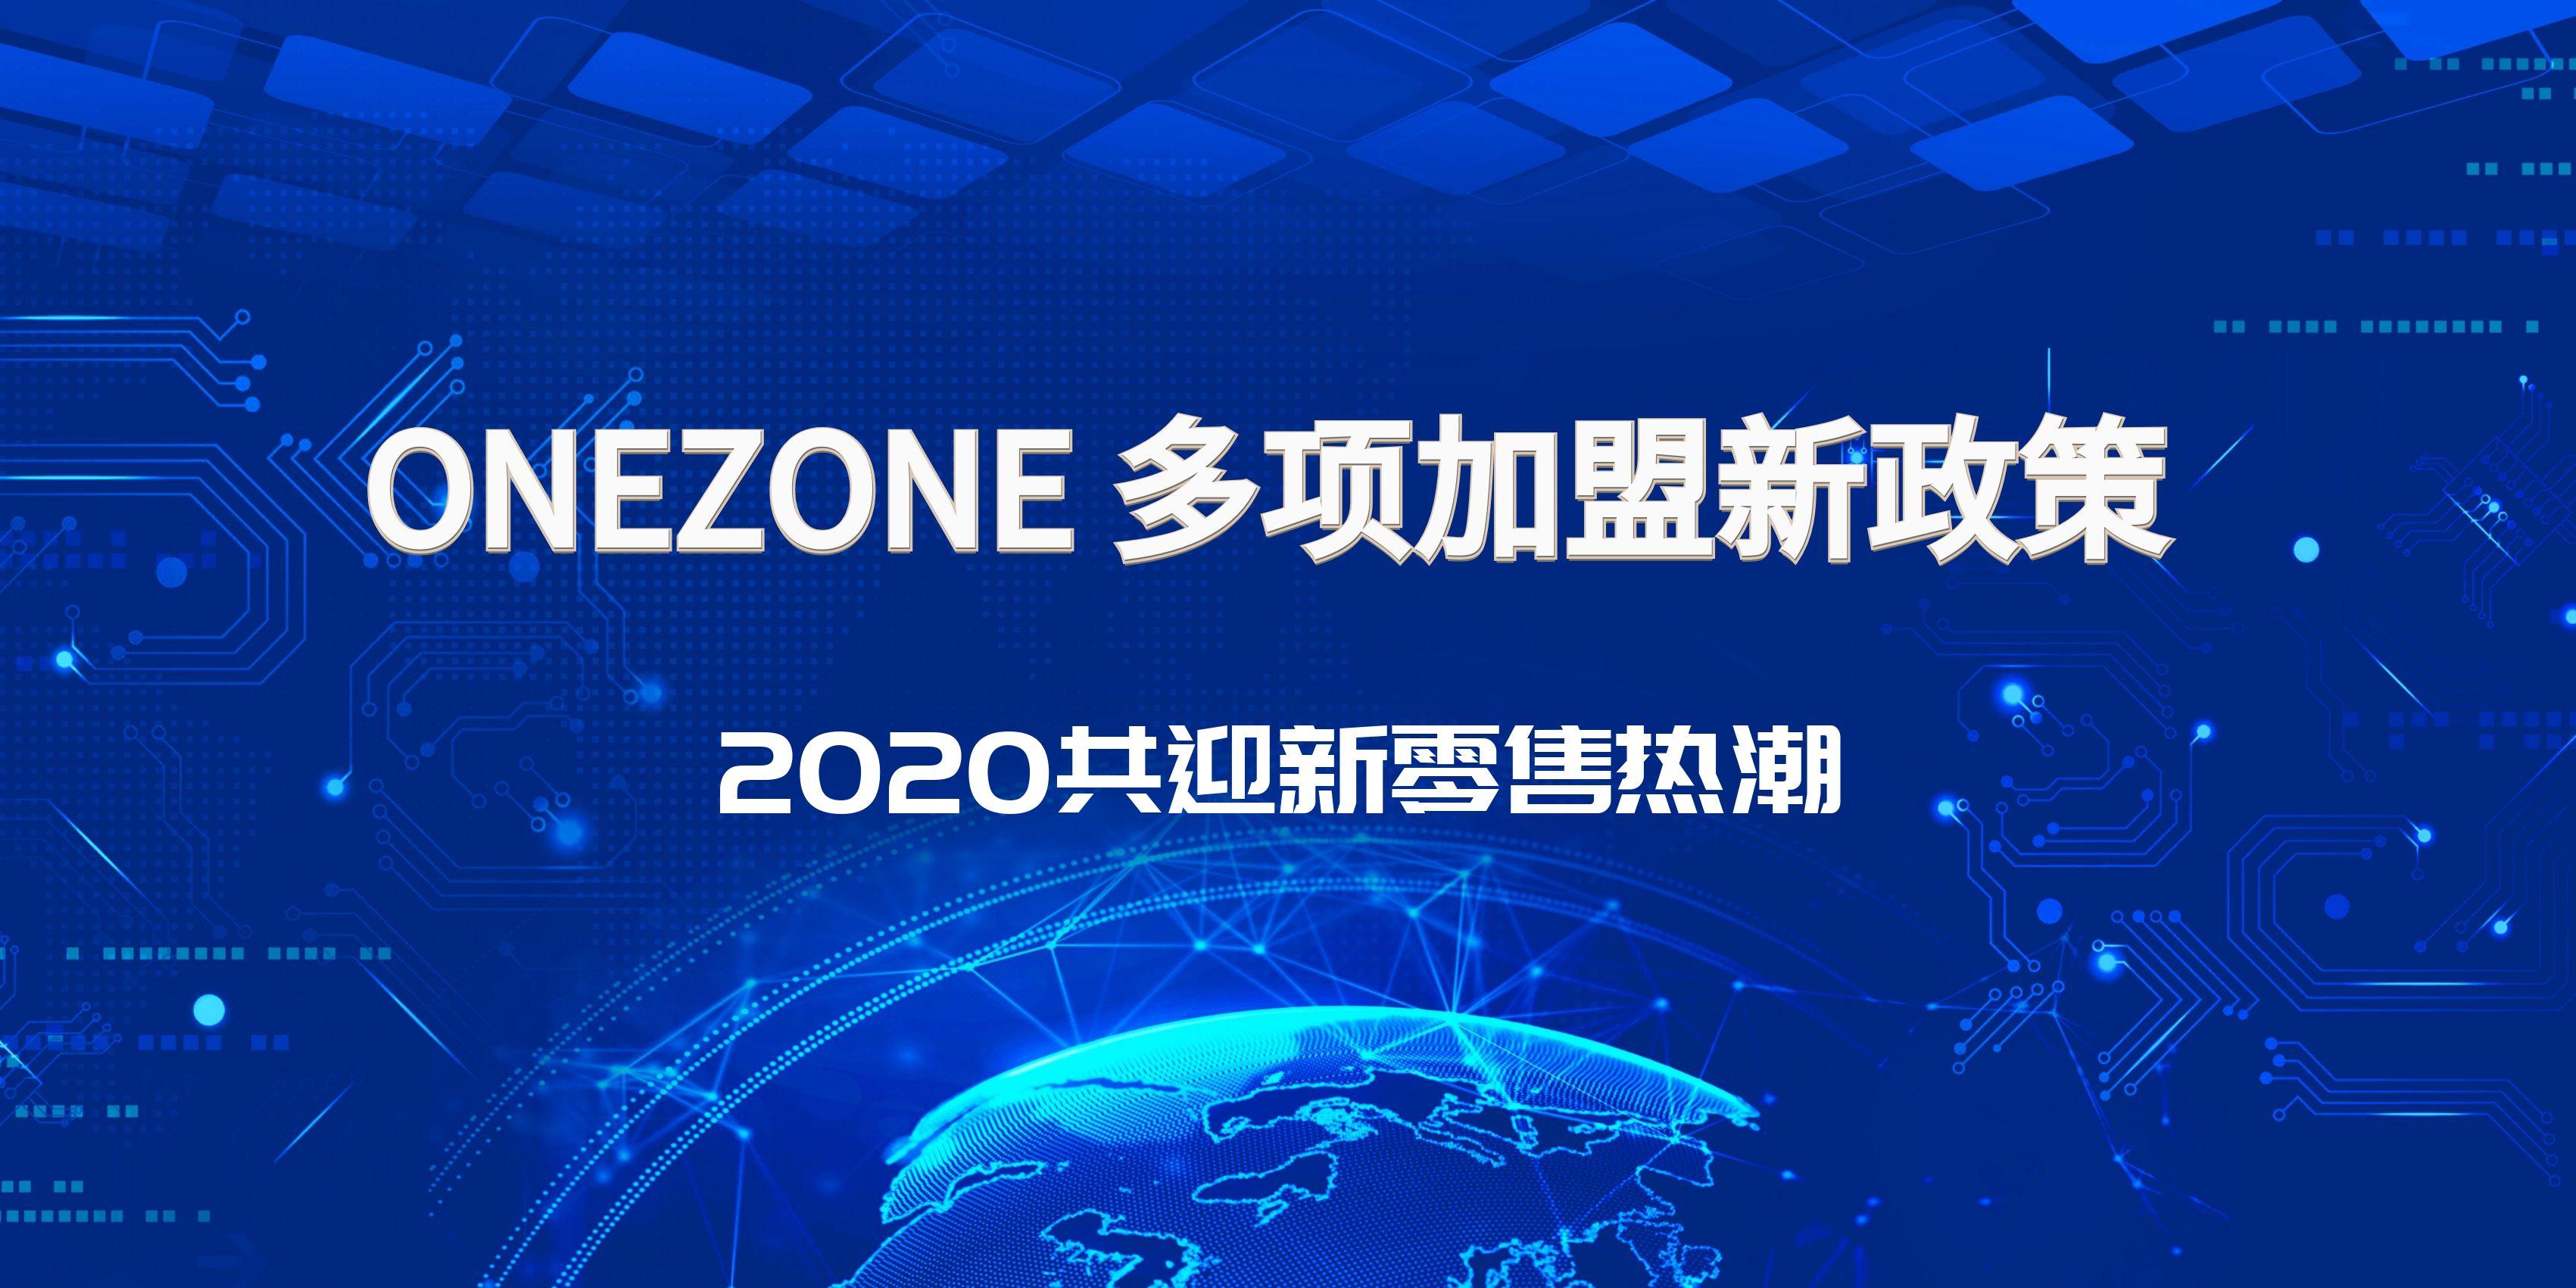 ONEZONE再推多项加盟优惠政策,掘金新零售业态蓝海